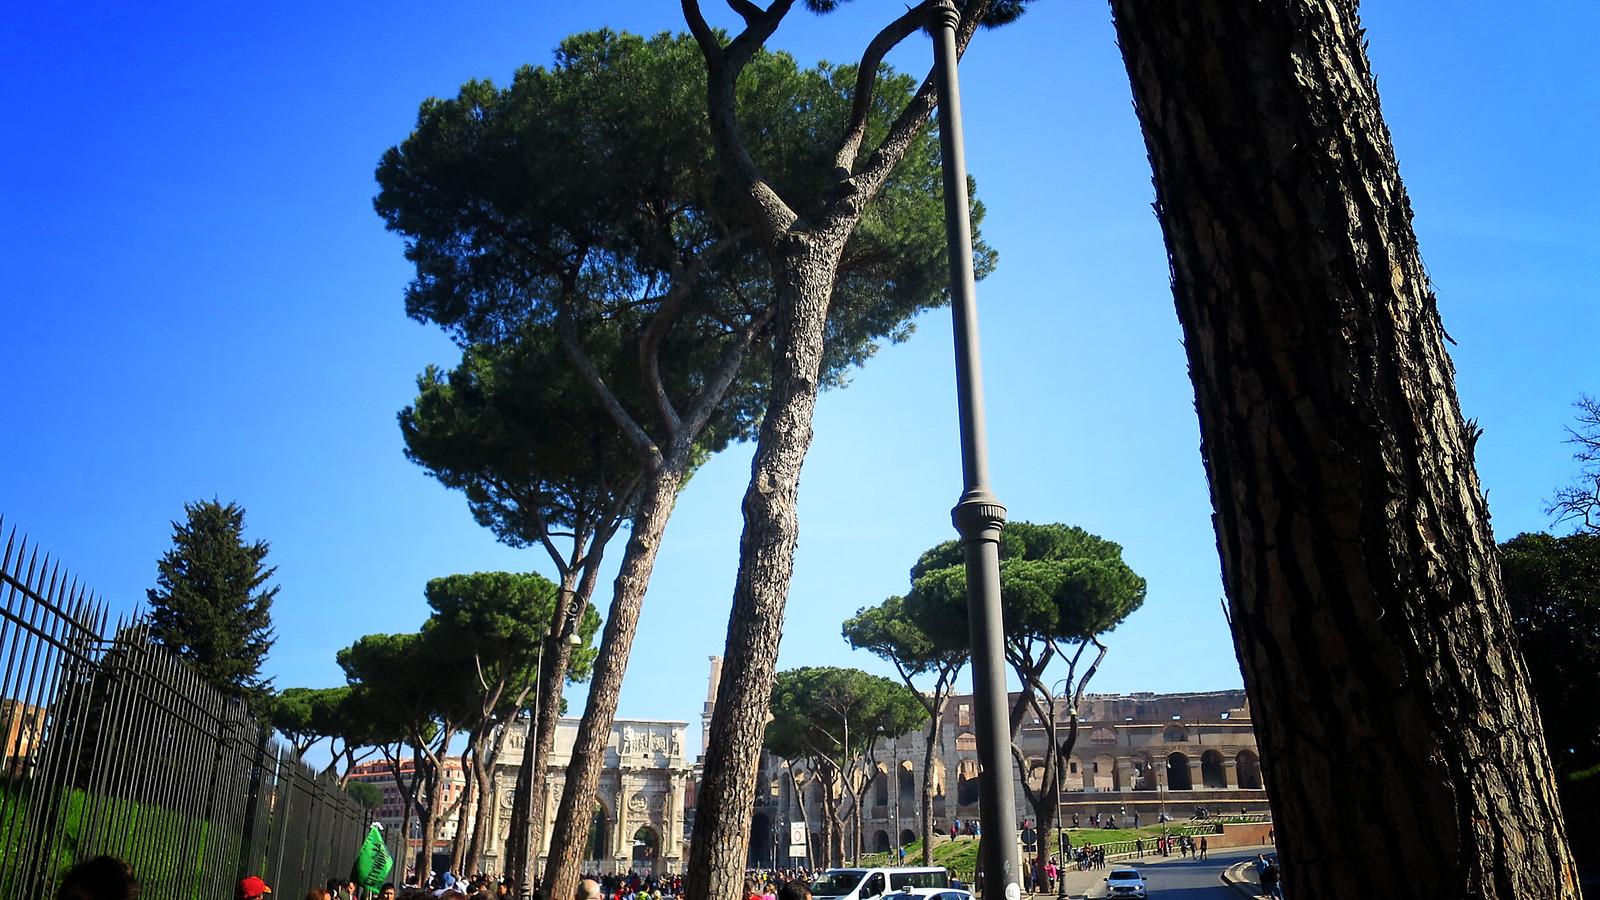 Impero Romano: Foro Romano - Palatino - Colosseo